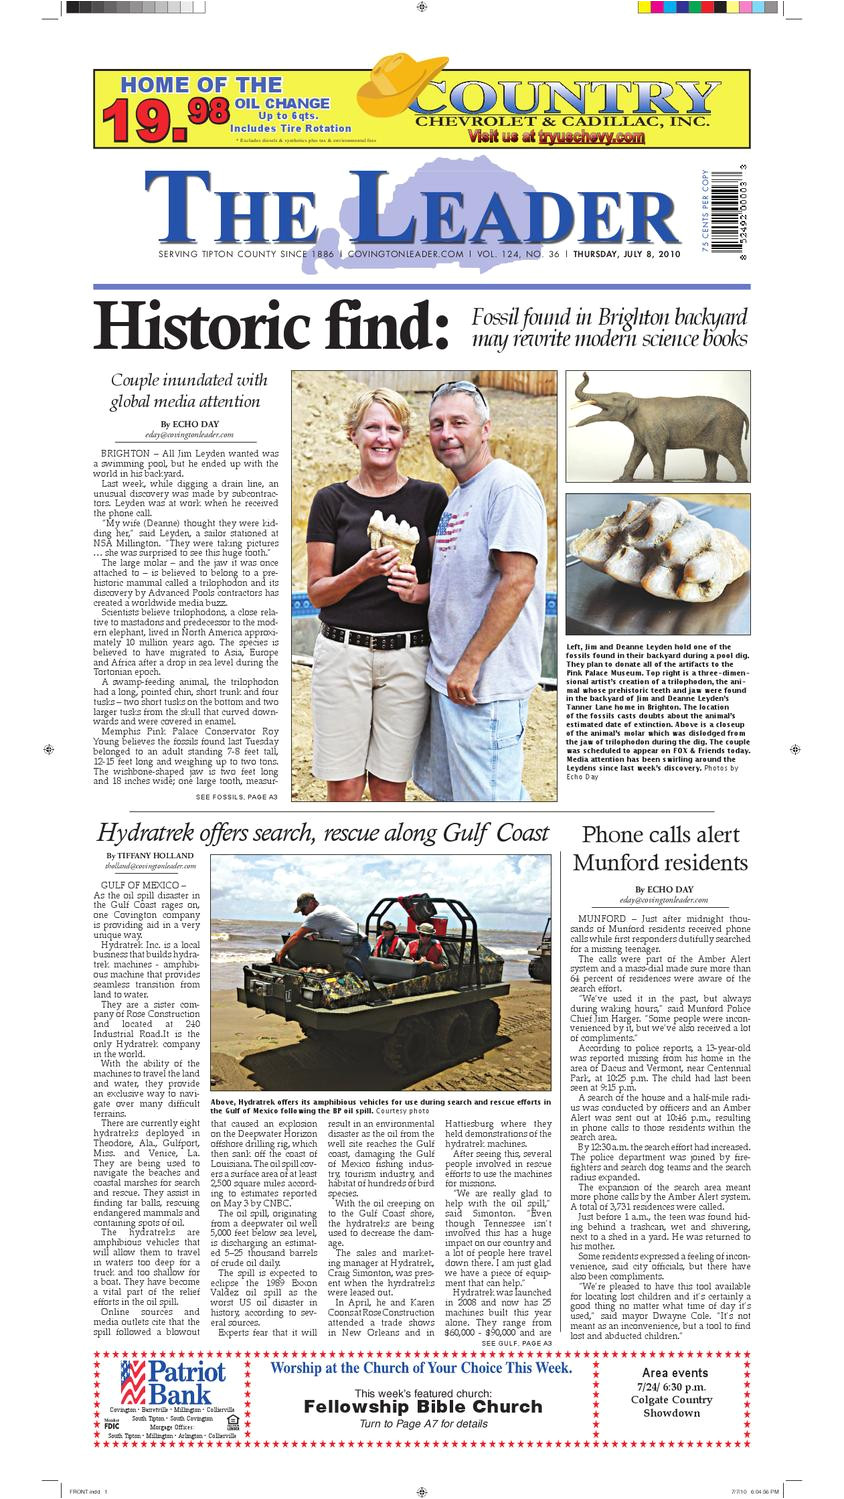 Hernandez Tire Shop Hattiesburg Ms Phone Number the Leader July 8 2010 by the Leader issuu